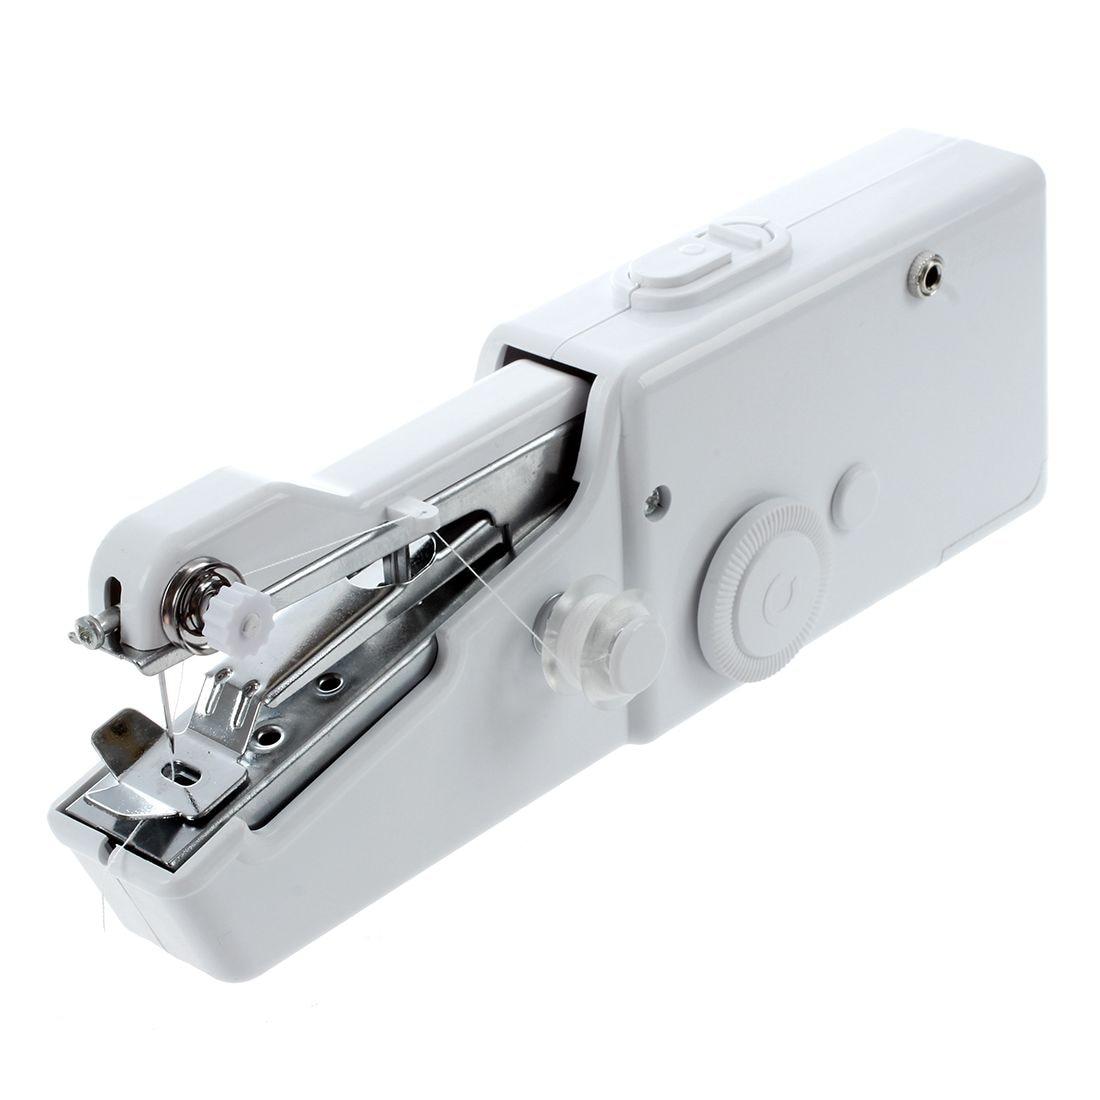 Mini Home Travel Desk Portable Sew Quick Hand-held needle Clothes Sewing Machine maquina de coser de mano